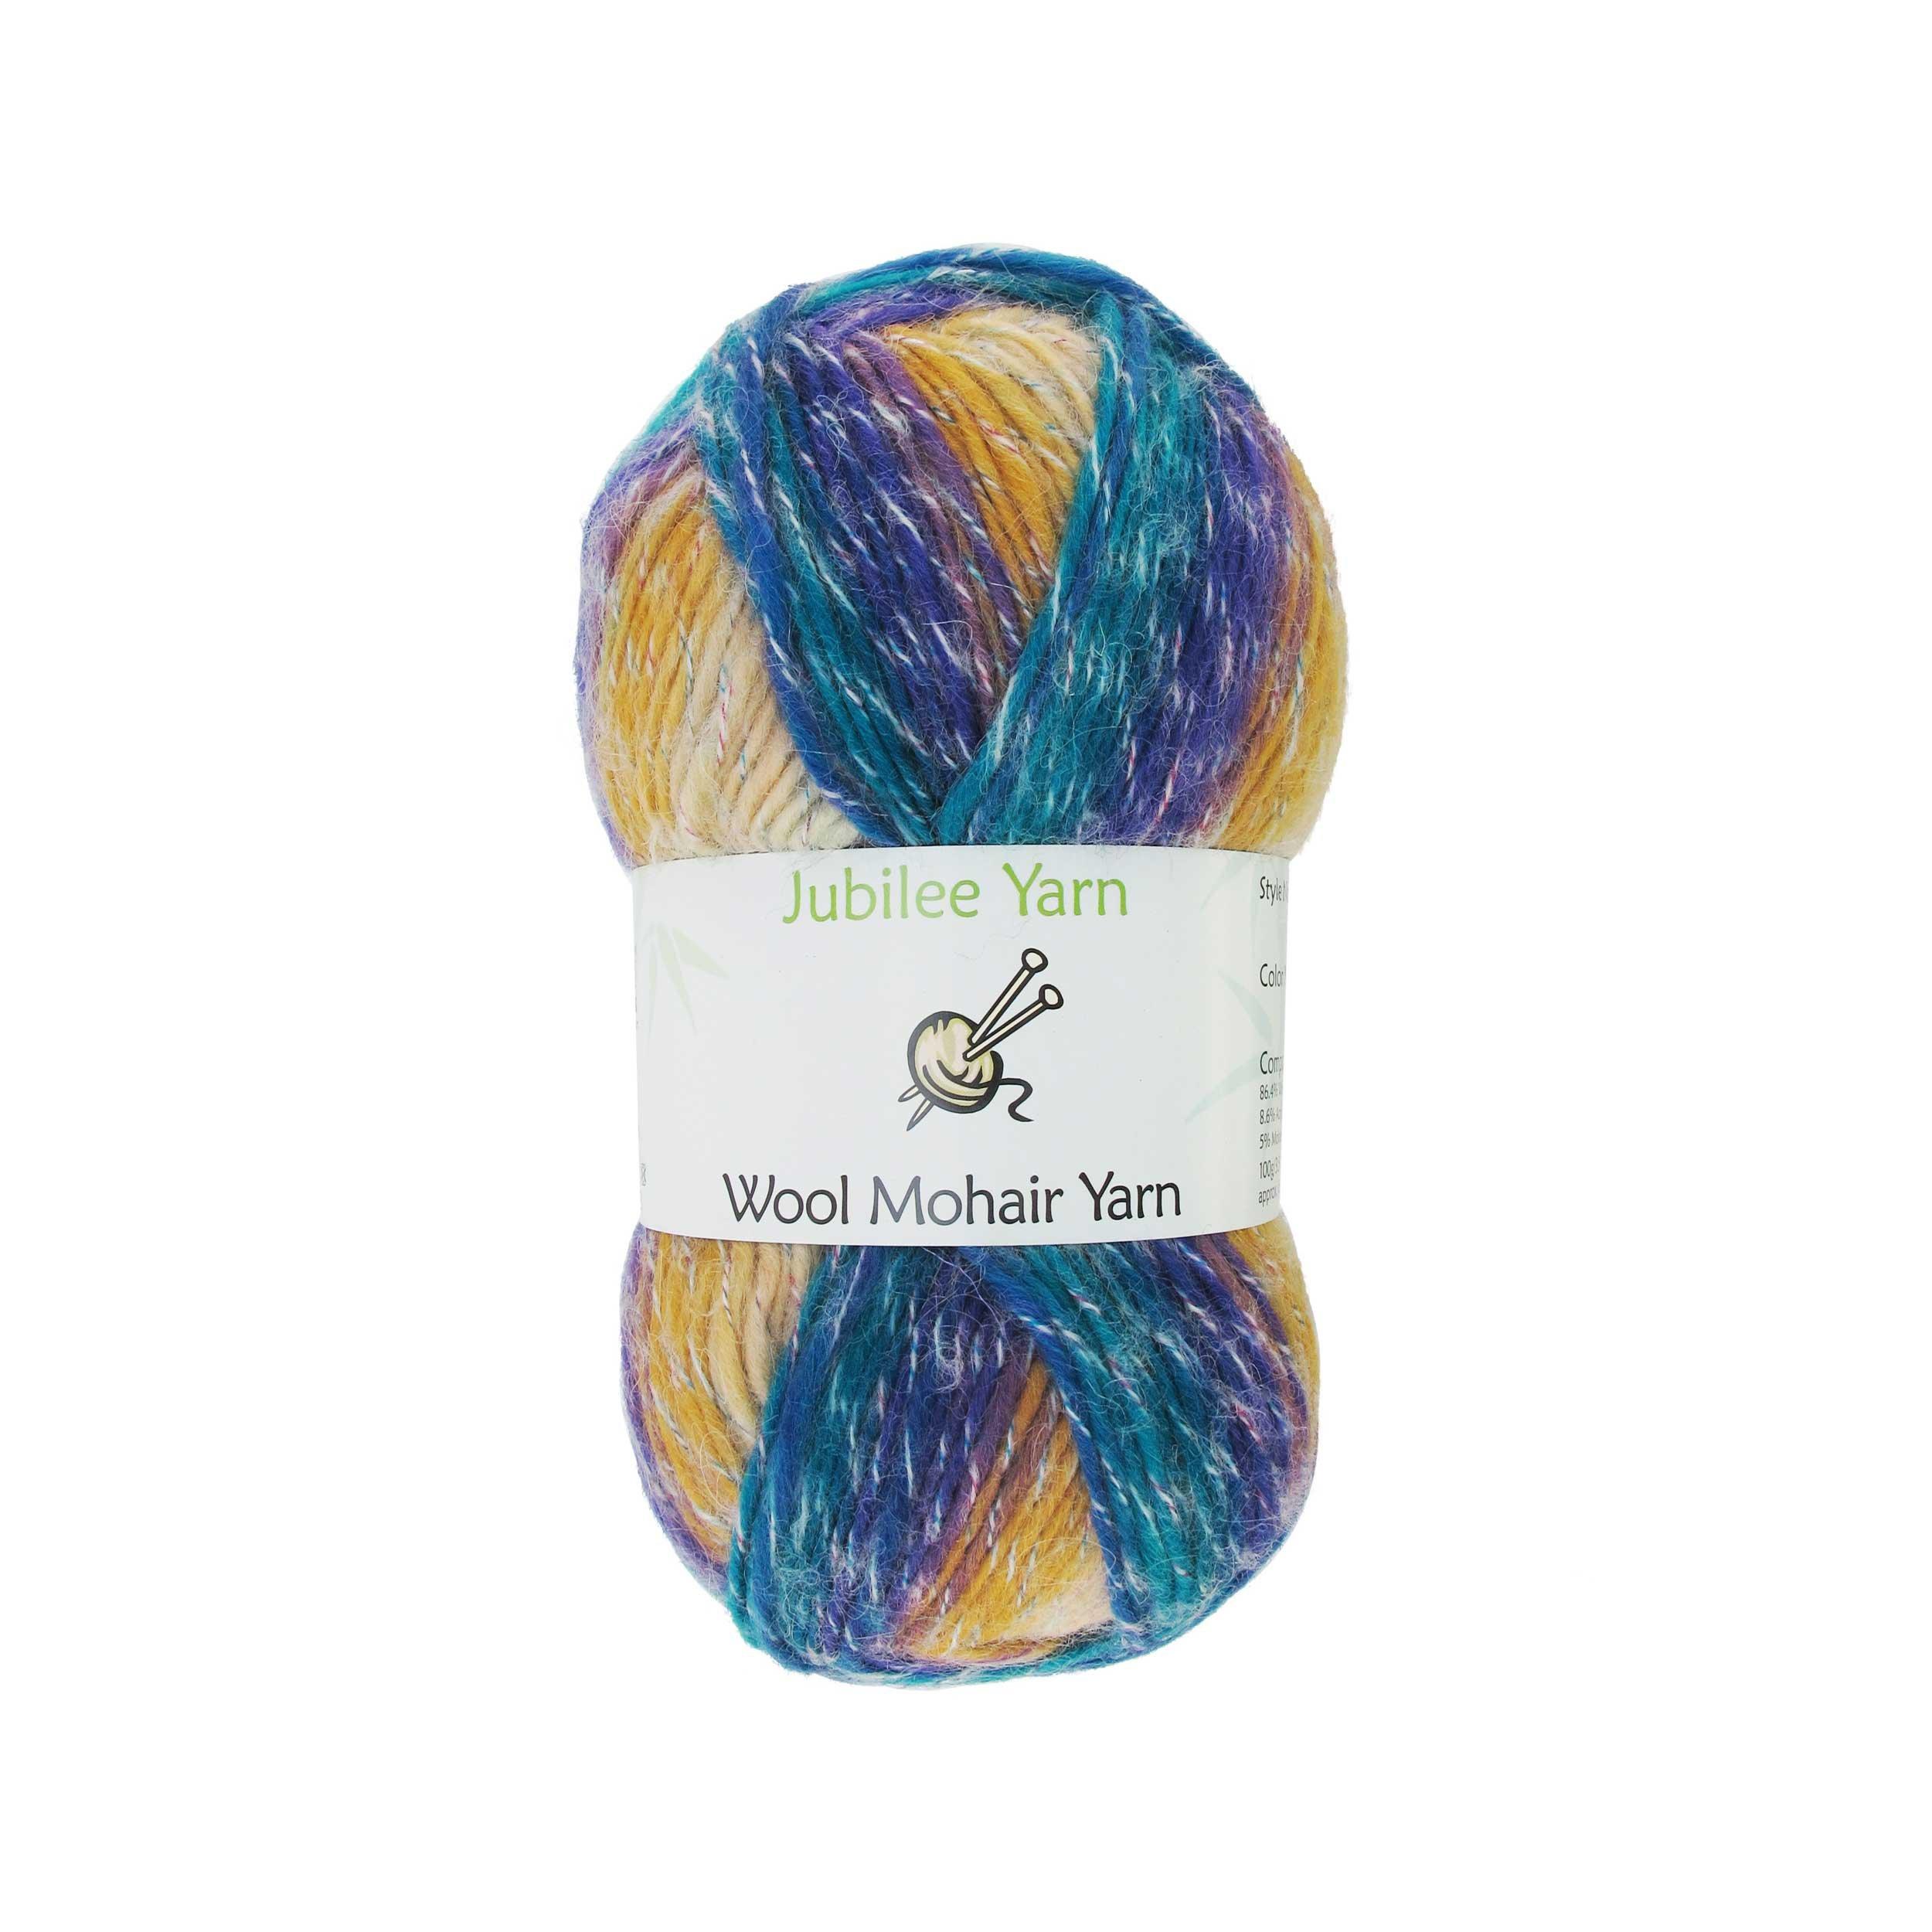 BambooMN Brand - Wool Blend Yarn Worsted Weight - Mohair Yarn - 100g/Skeins of Tropic Multi - 2 Skeins